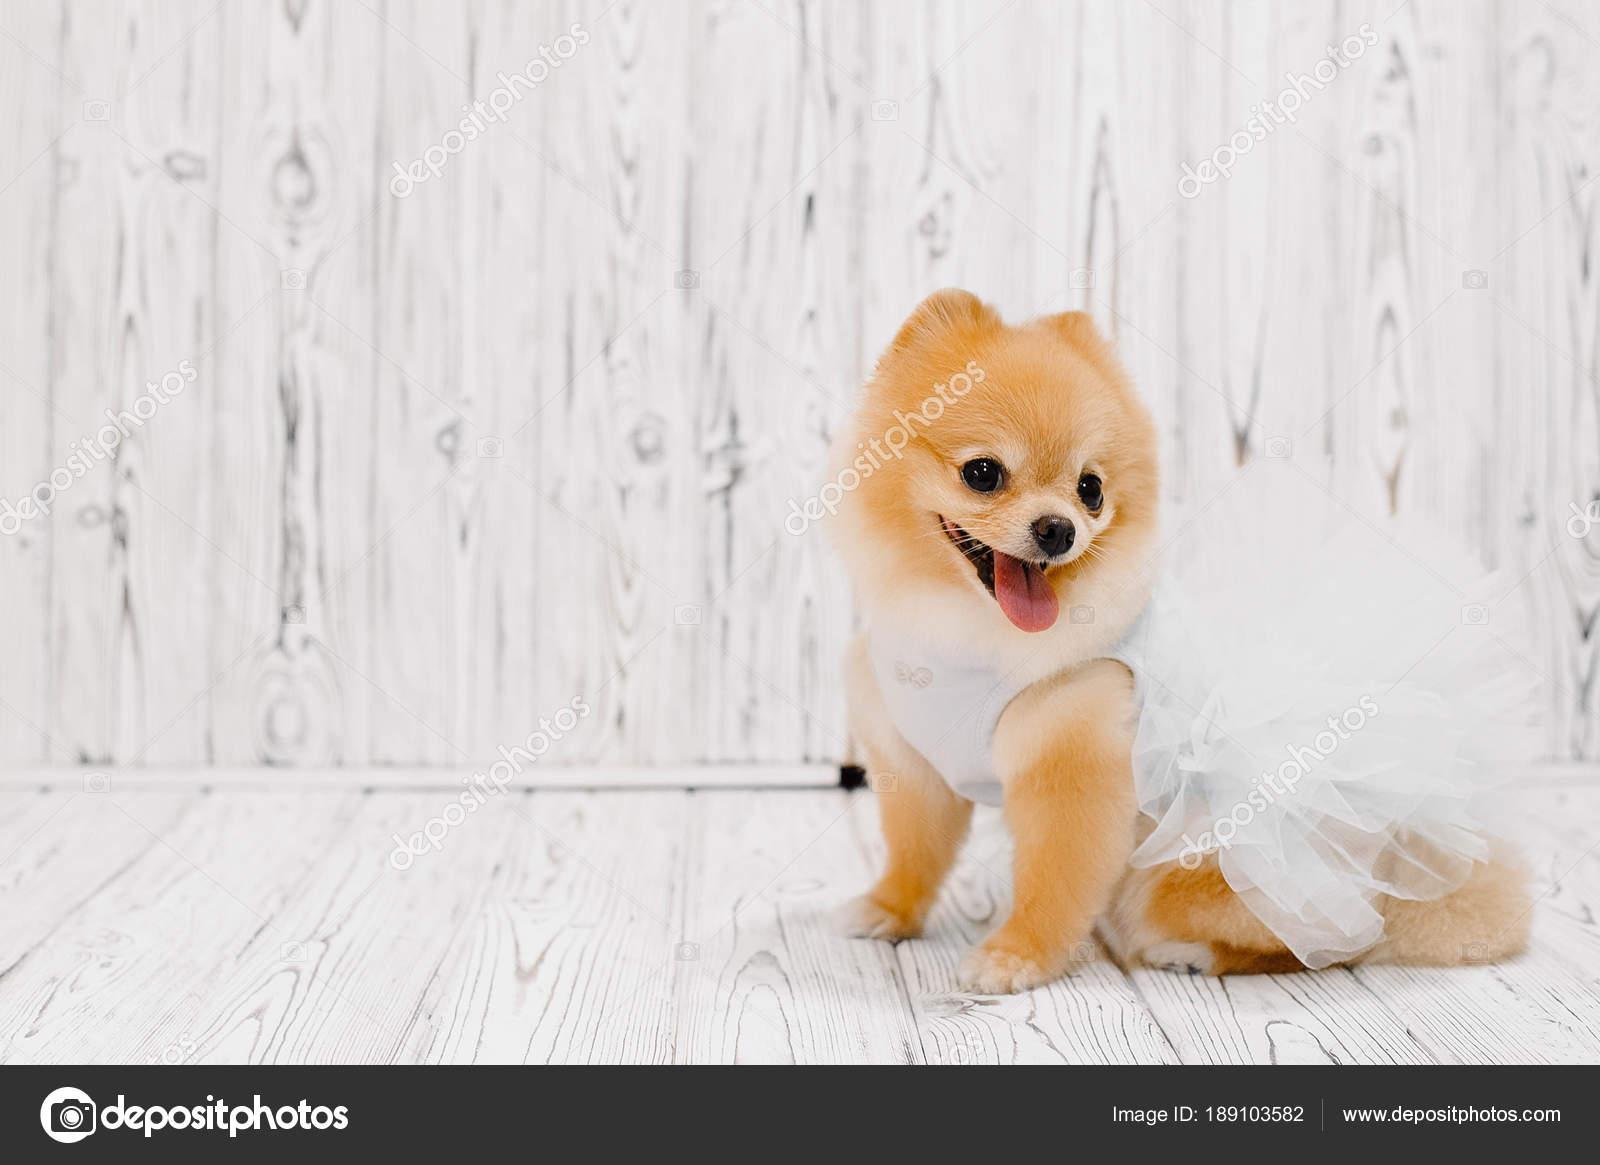 Fondo En Stock De Hermoso Pomerania Foto — Pomeranian Madera MqSzGLUVp